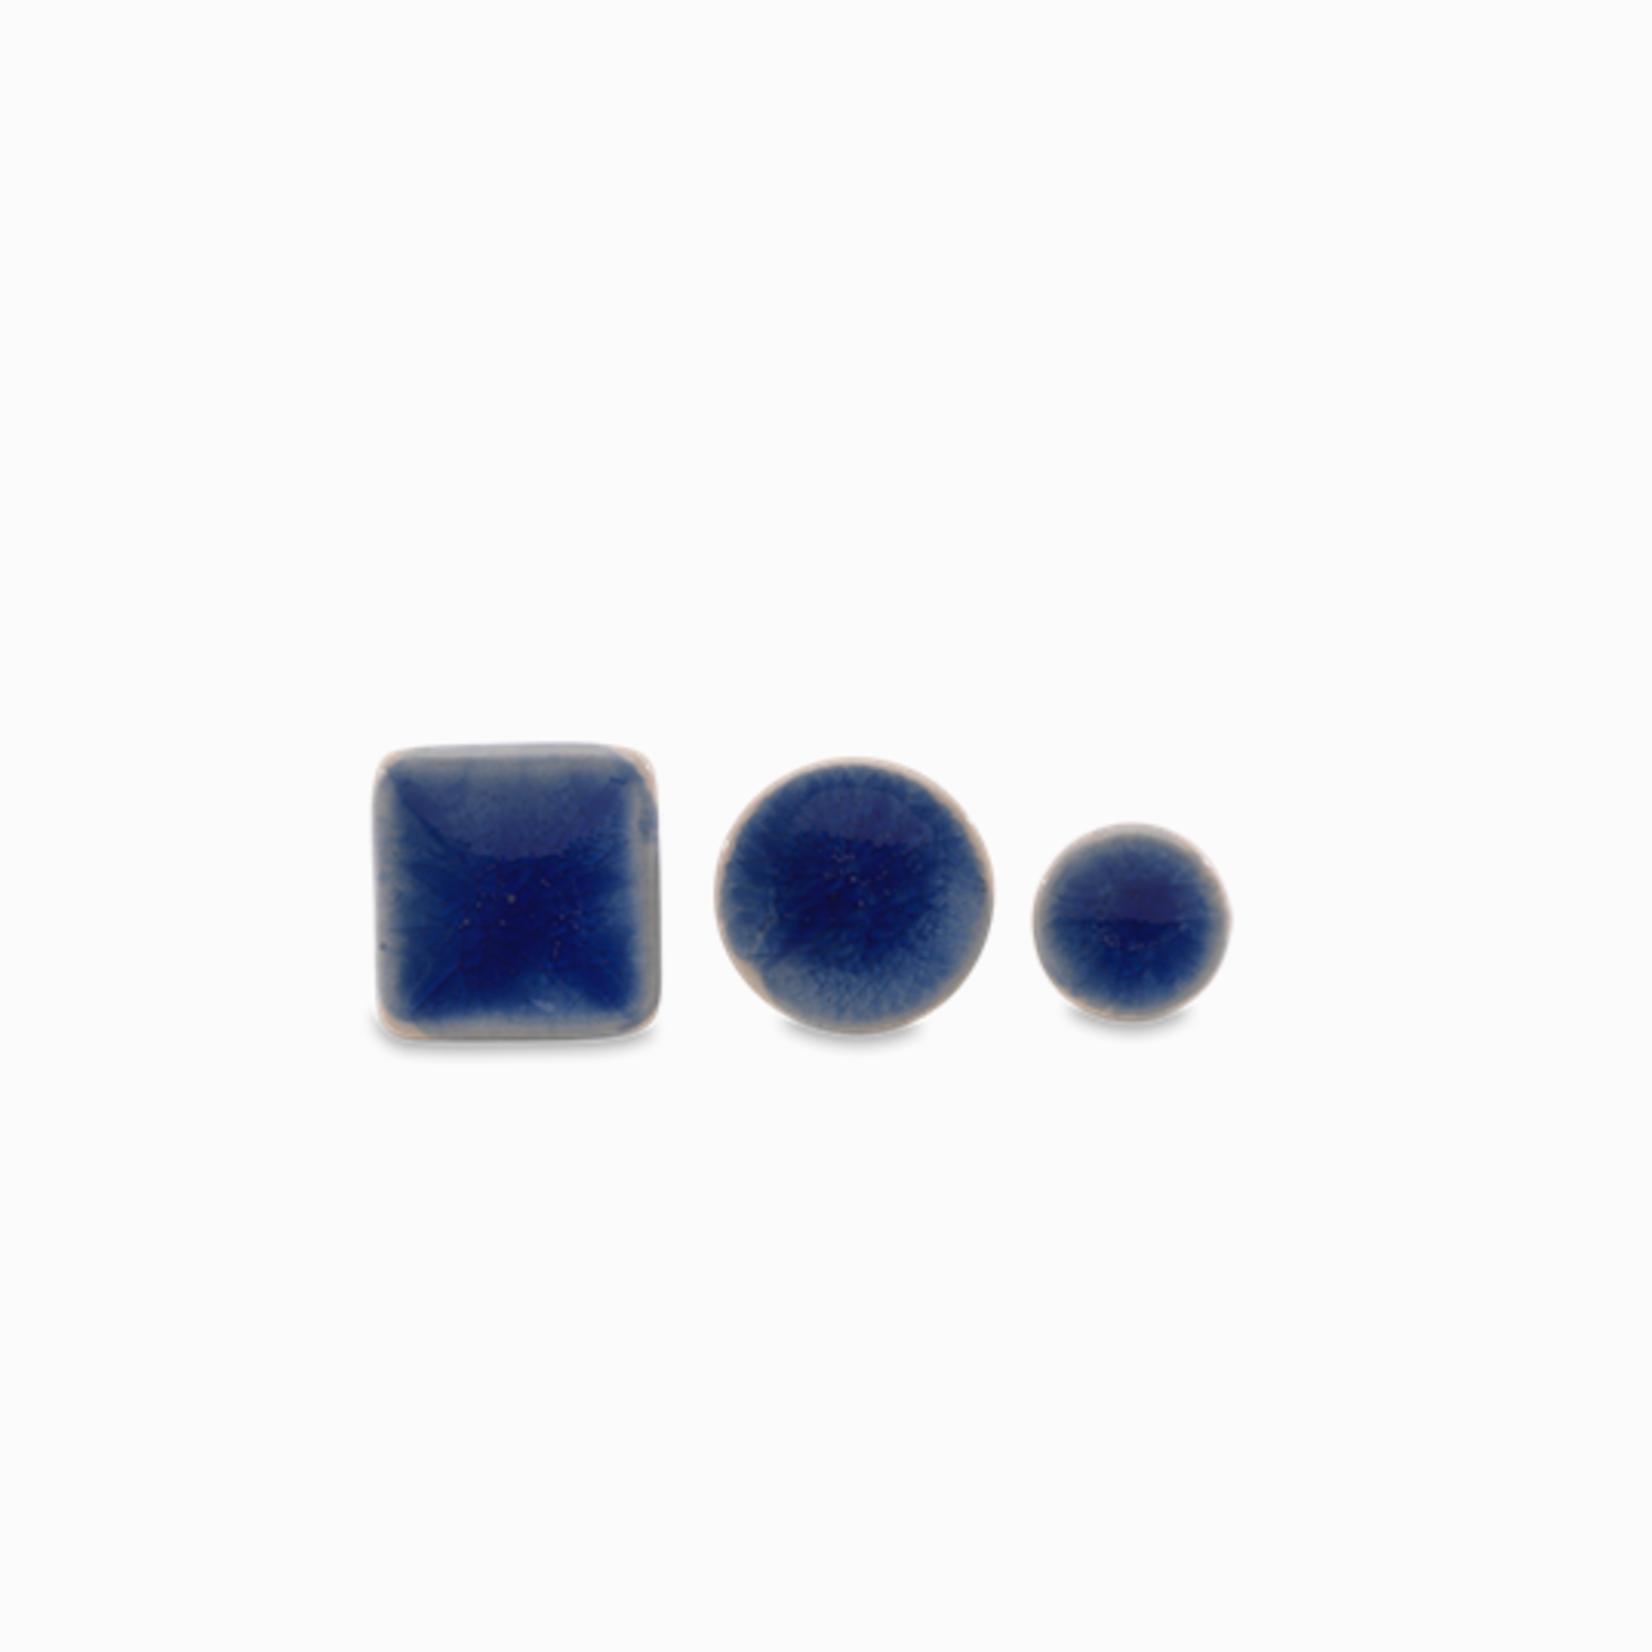 Nkuku Bira Blue Ceramic Knob - Small Round